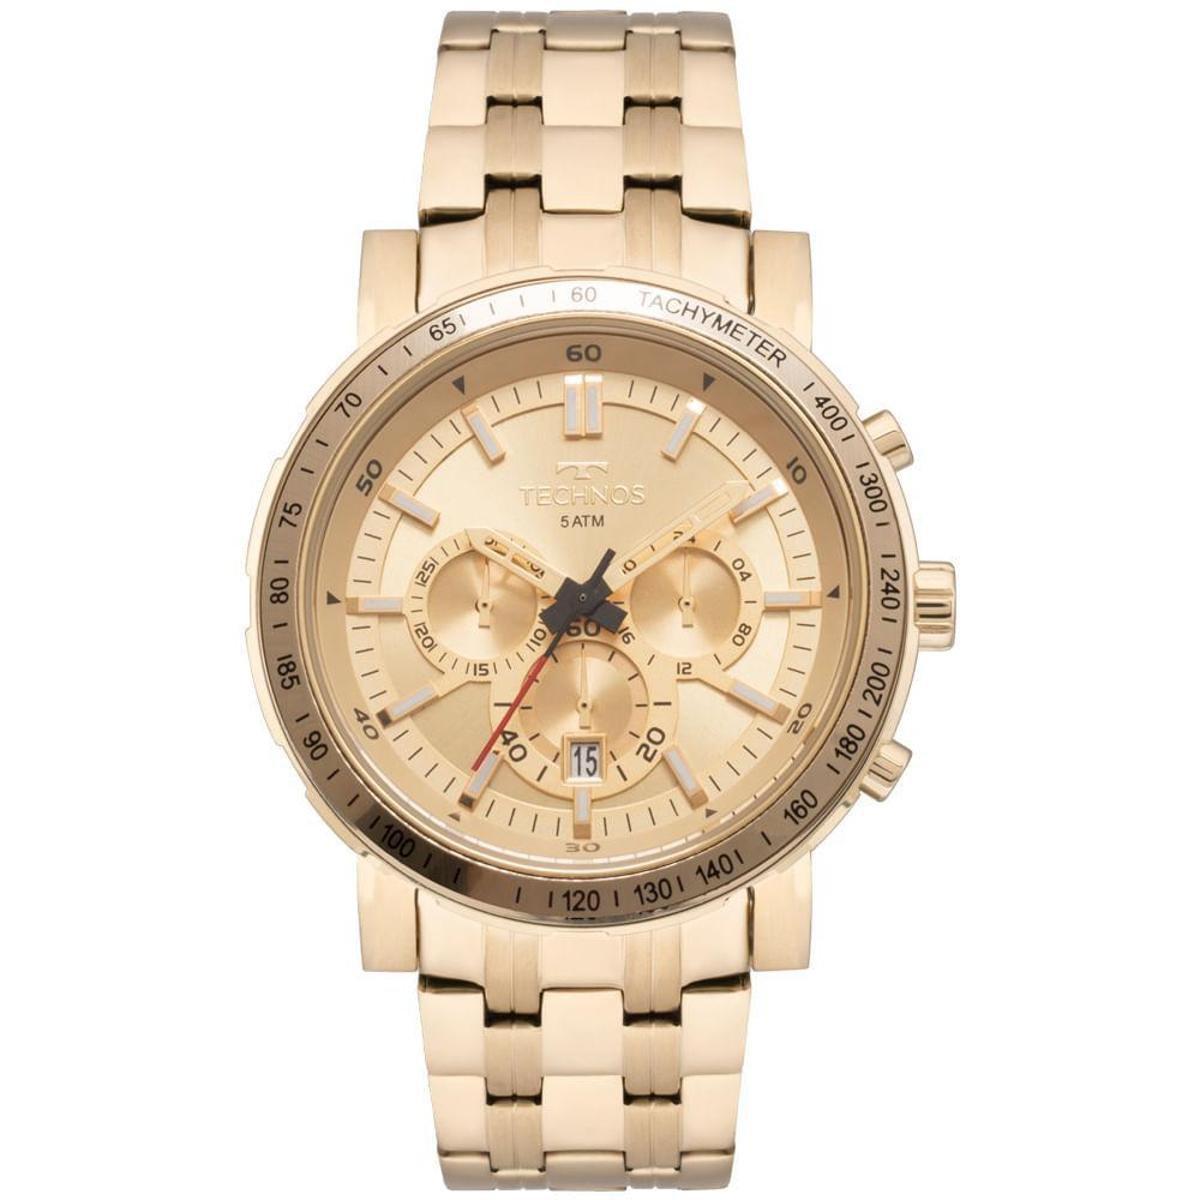 63d8b293965b4 Relógio Technos Masculino Skymaster - JS26AK 4X JS26AK 4X - Dourado -  Compre Agora